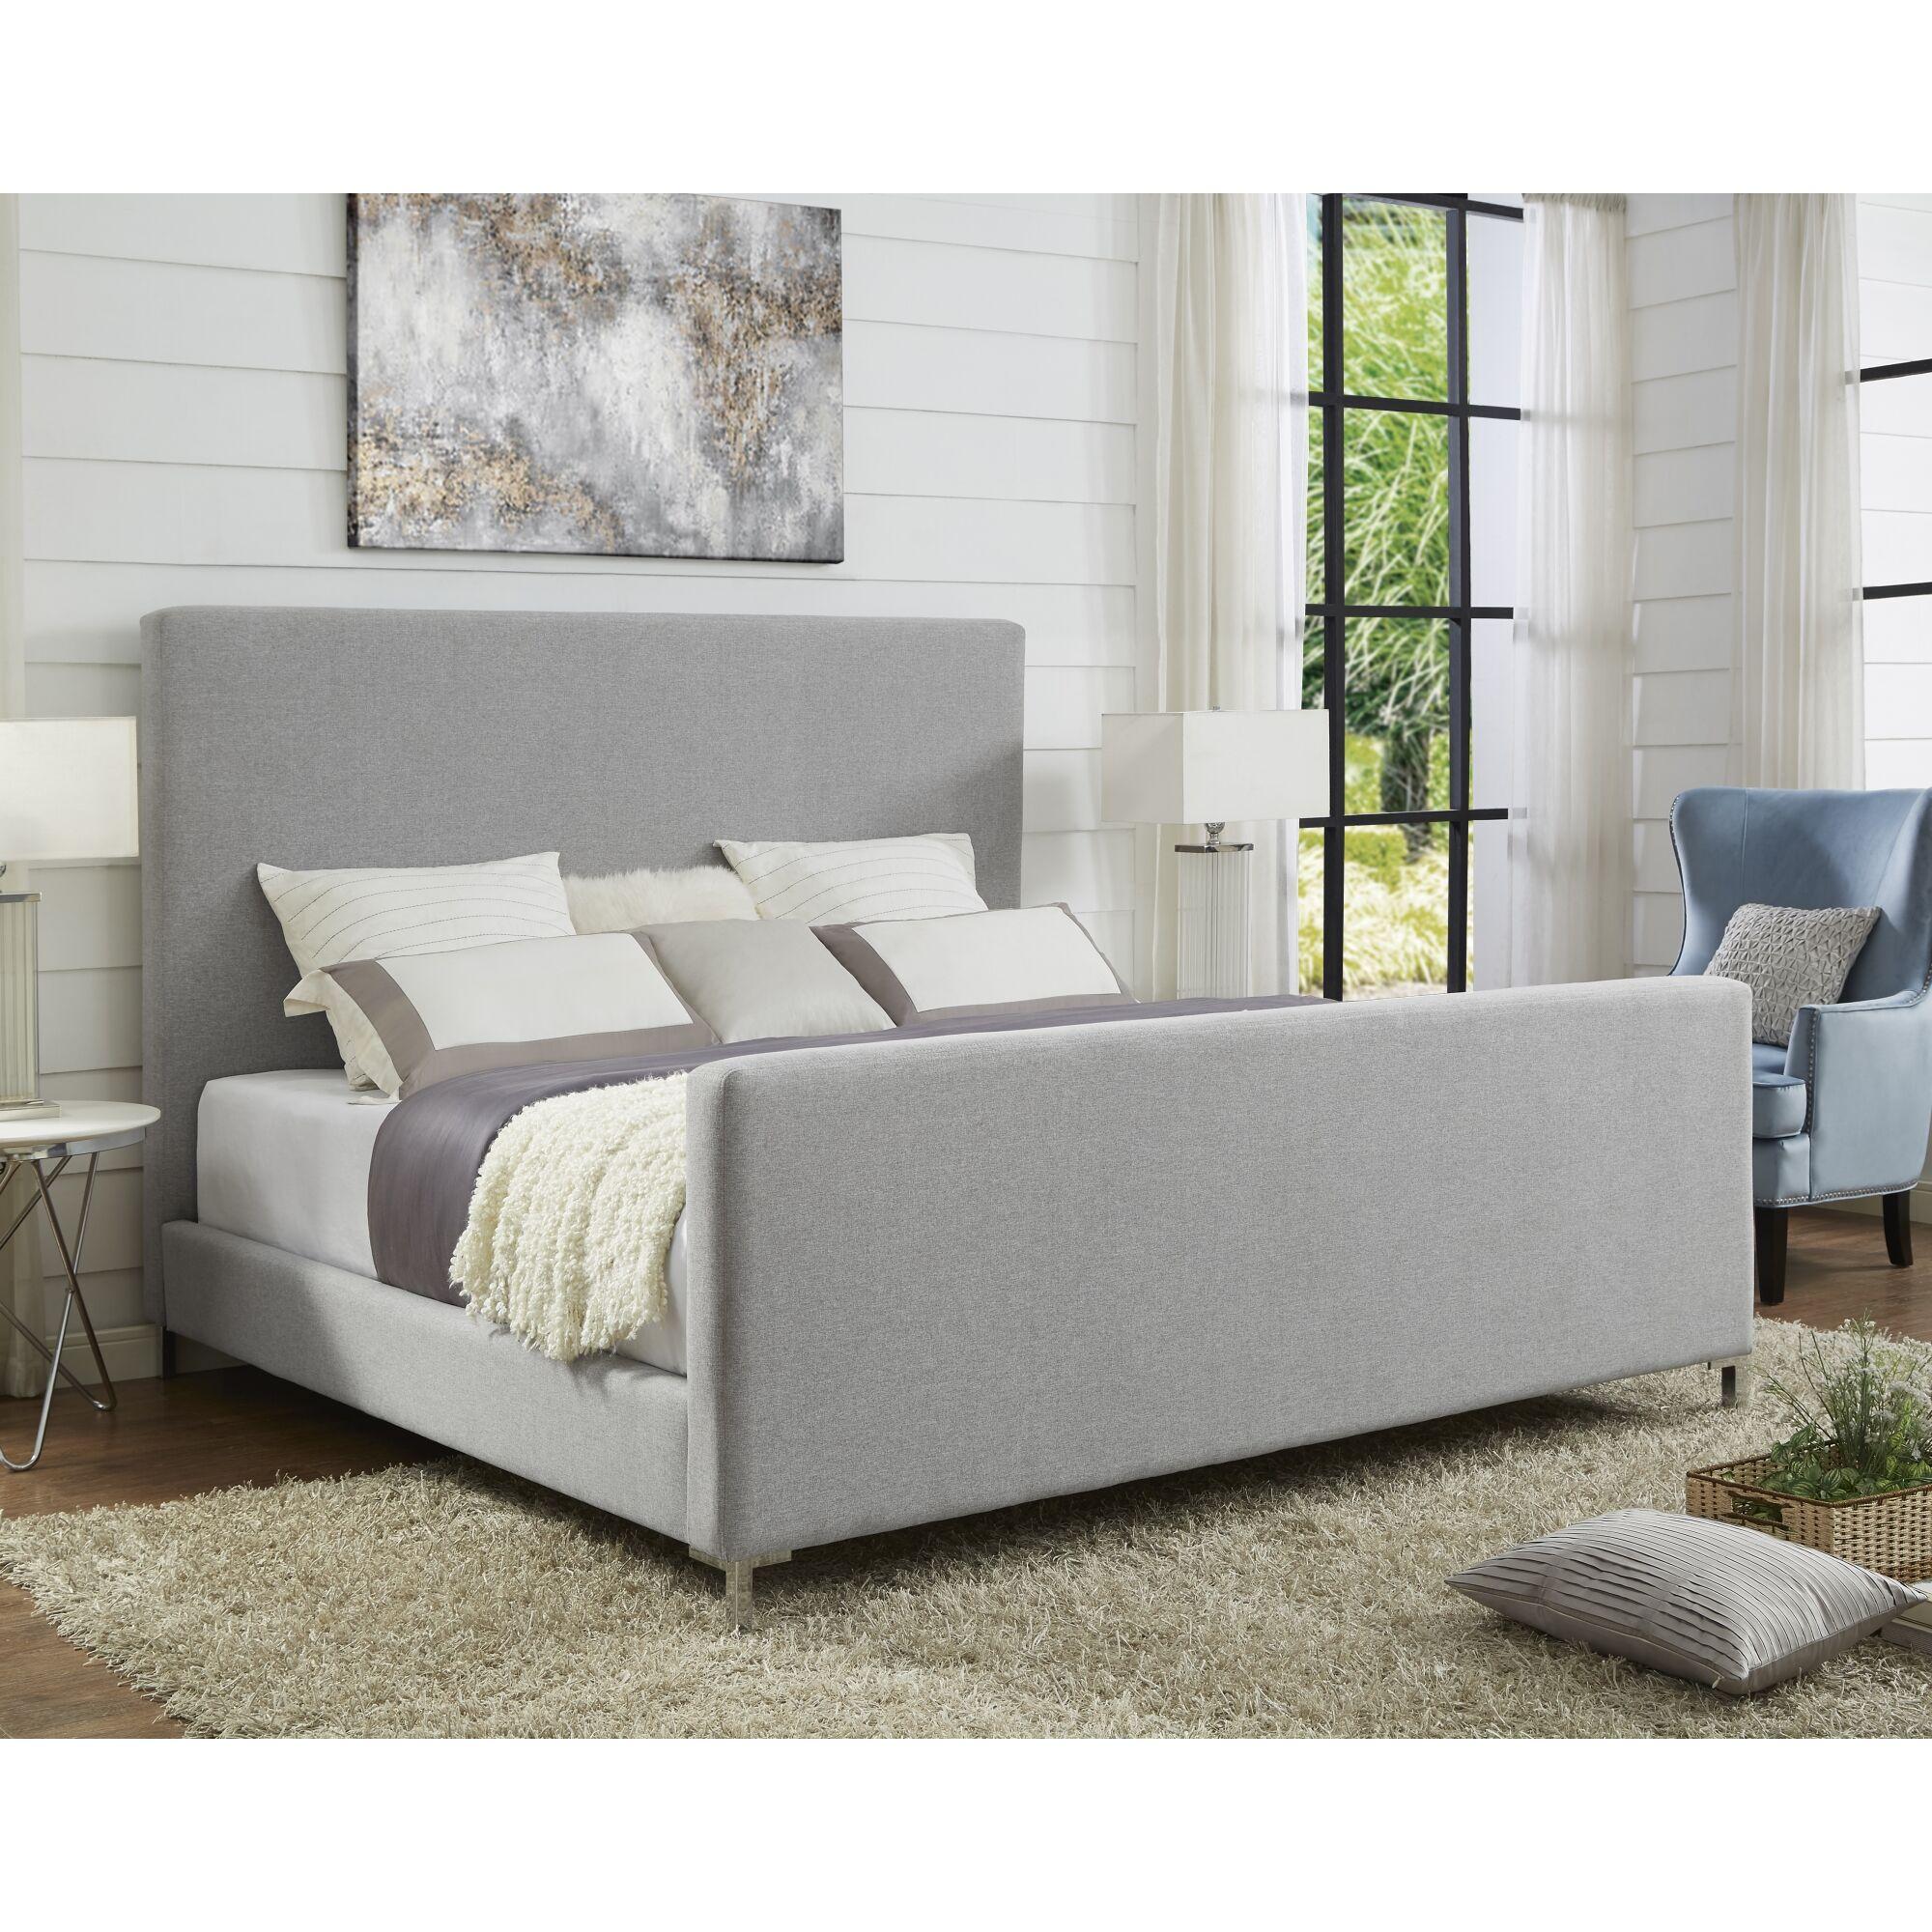 Ranstead Upholstered Platform Bed Color: Gray, Size: Queen